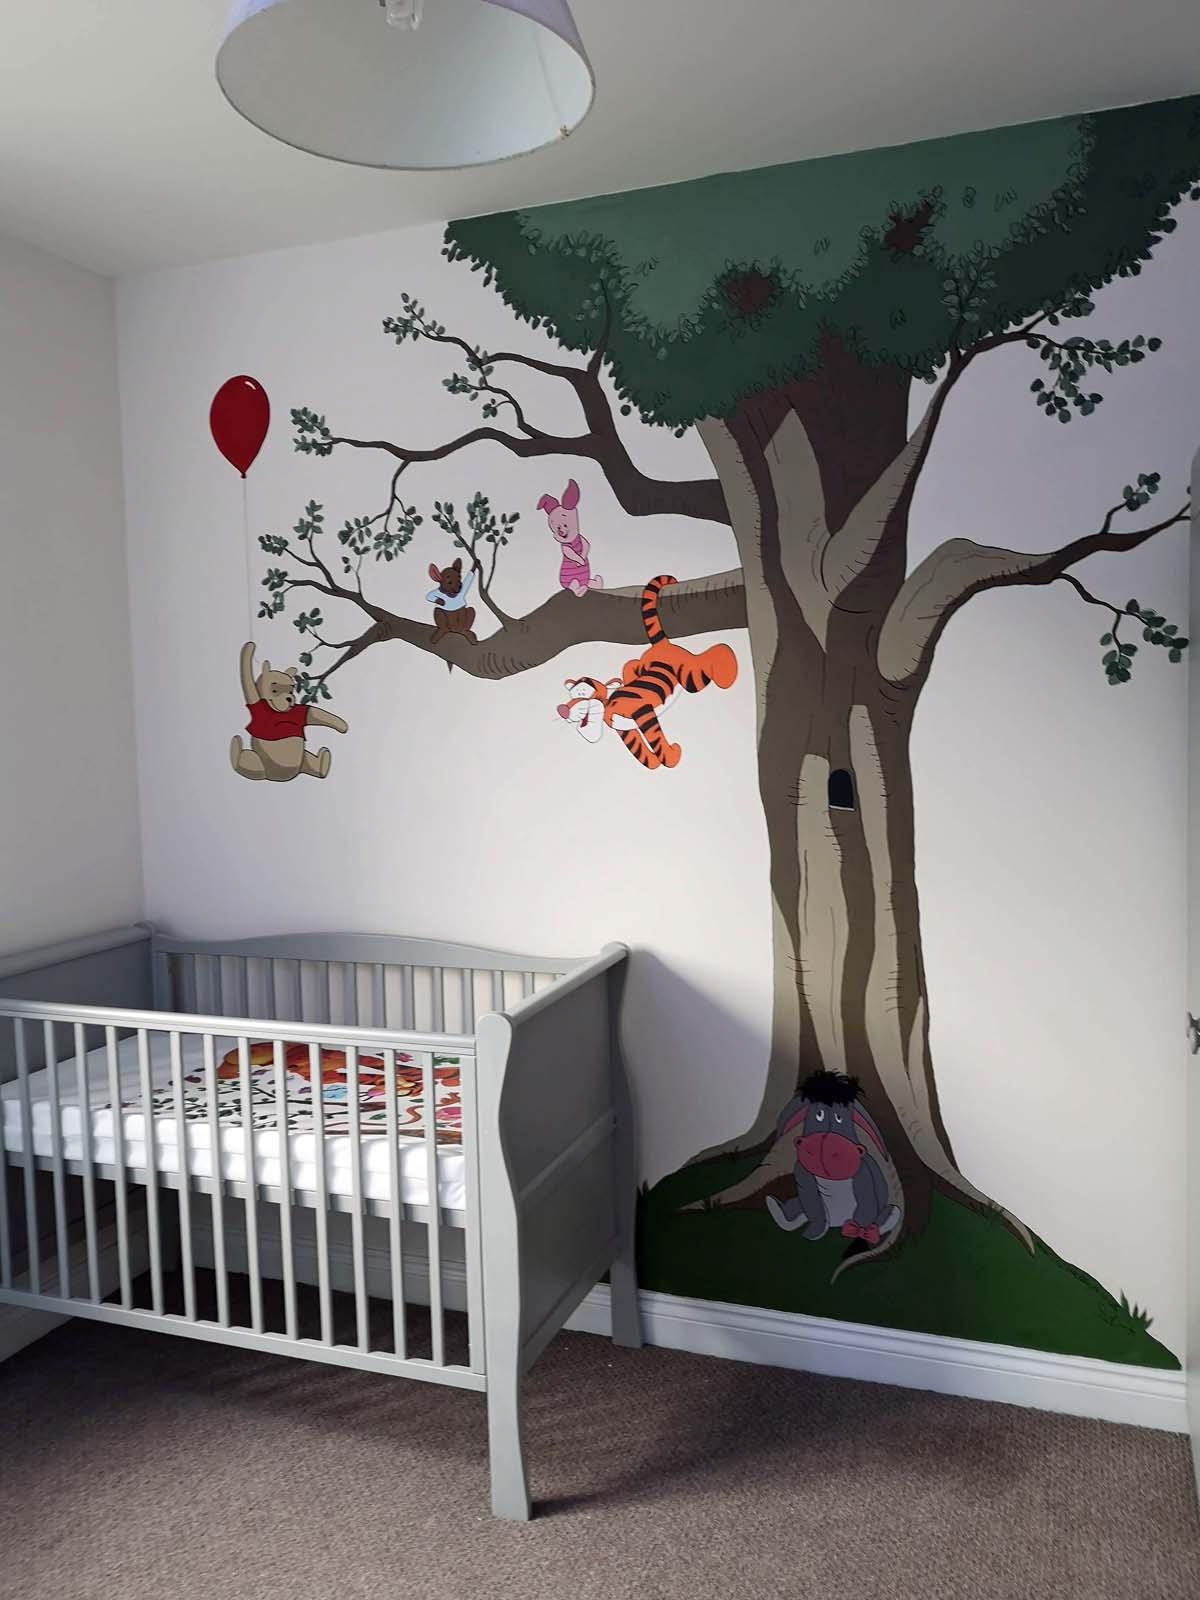 Winnie the pooh tree mural